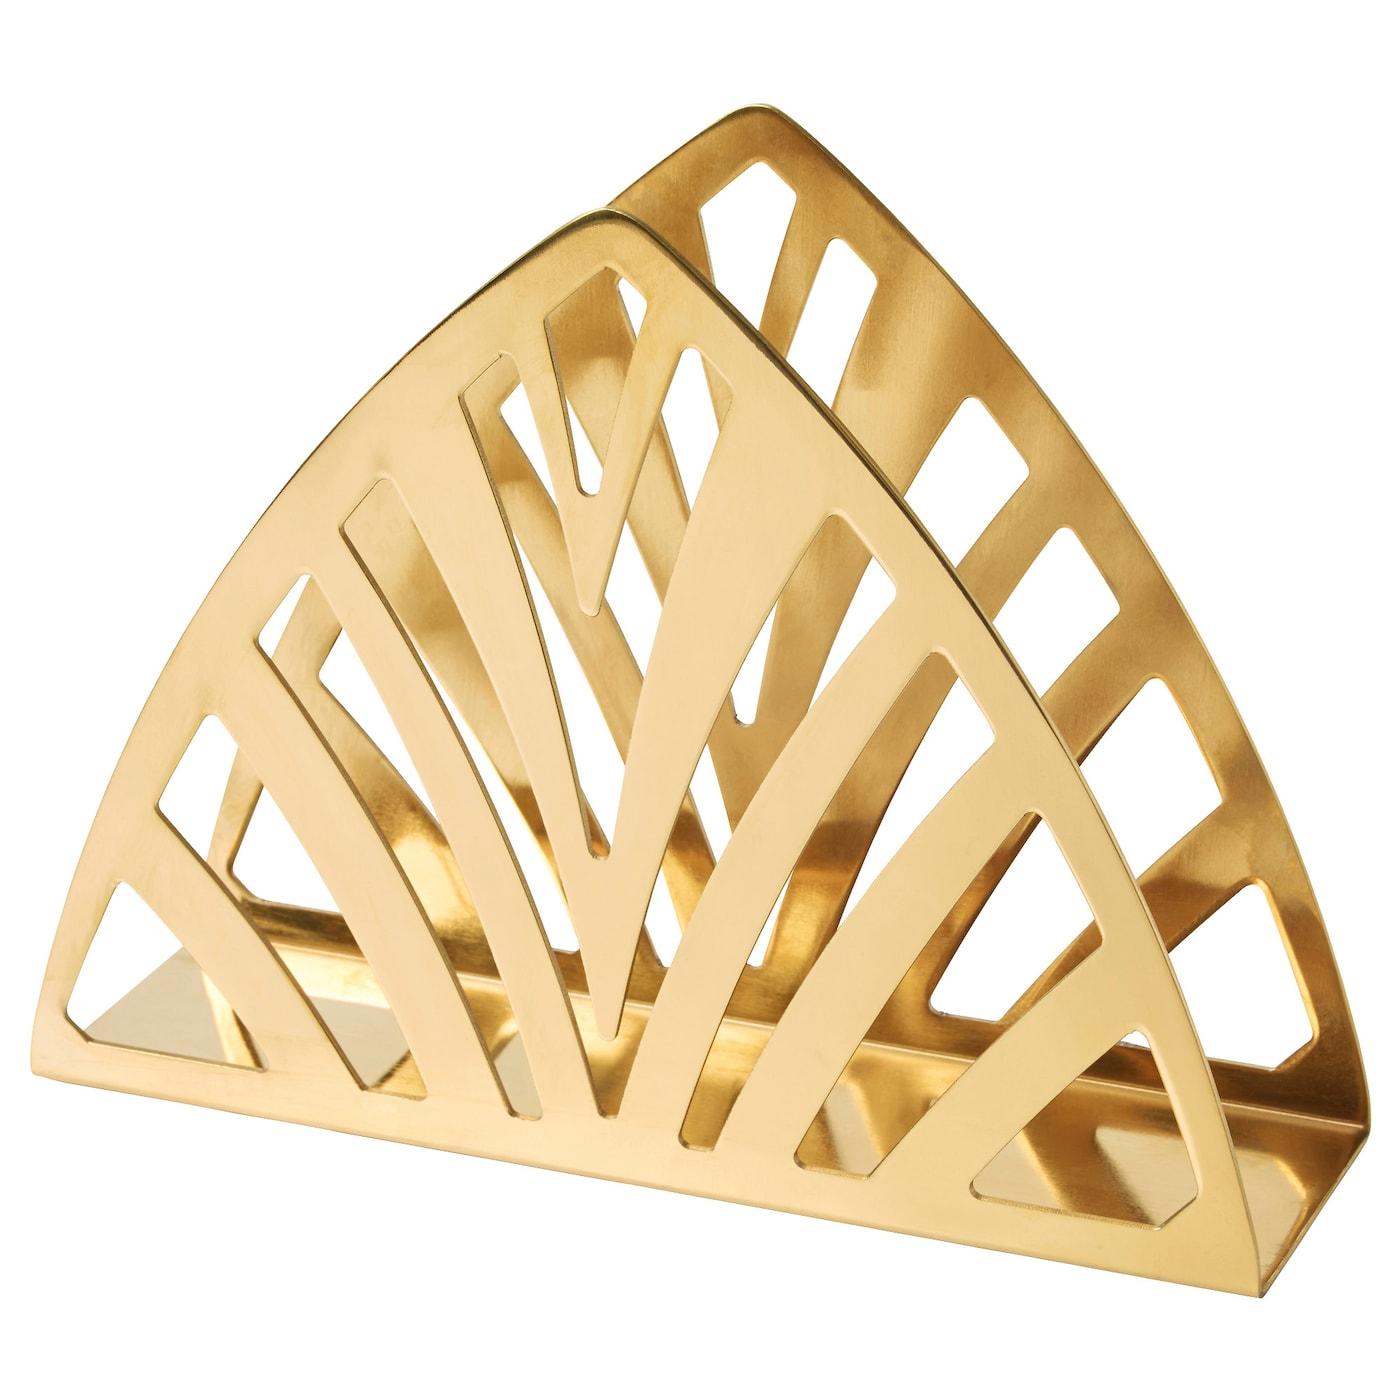 Ikea Rug Holder: GLATTIS Coasters With Holder Brass-colour 8.5 Cm